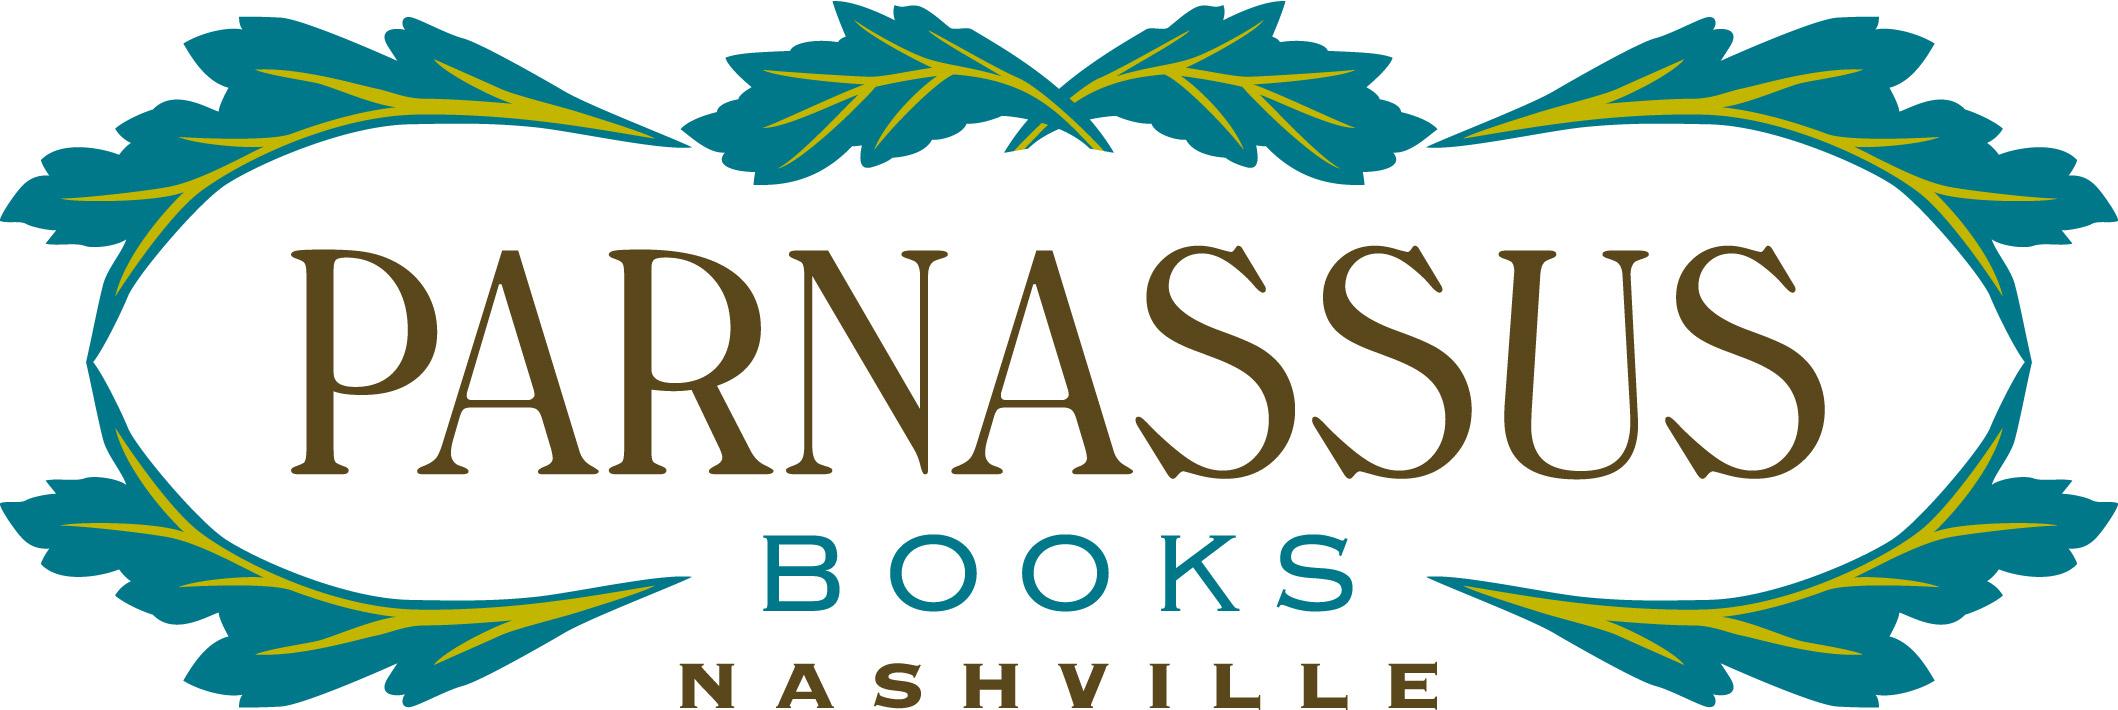 Parnassus Logo 3 color